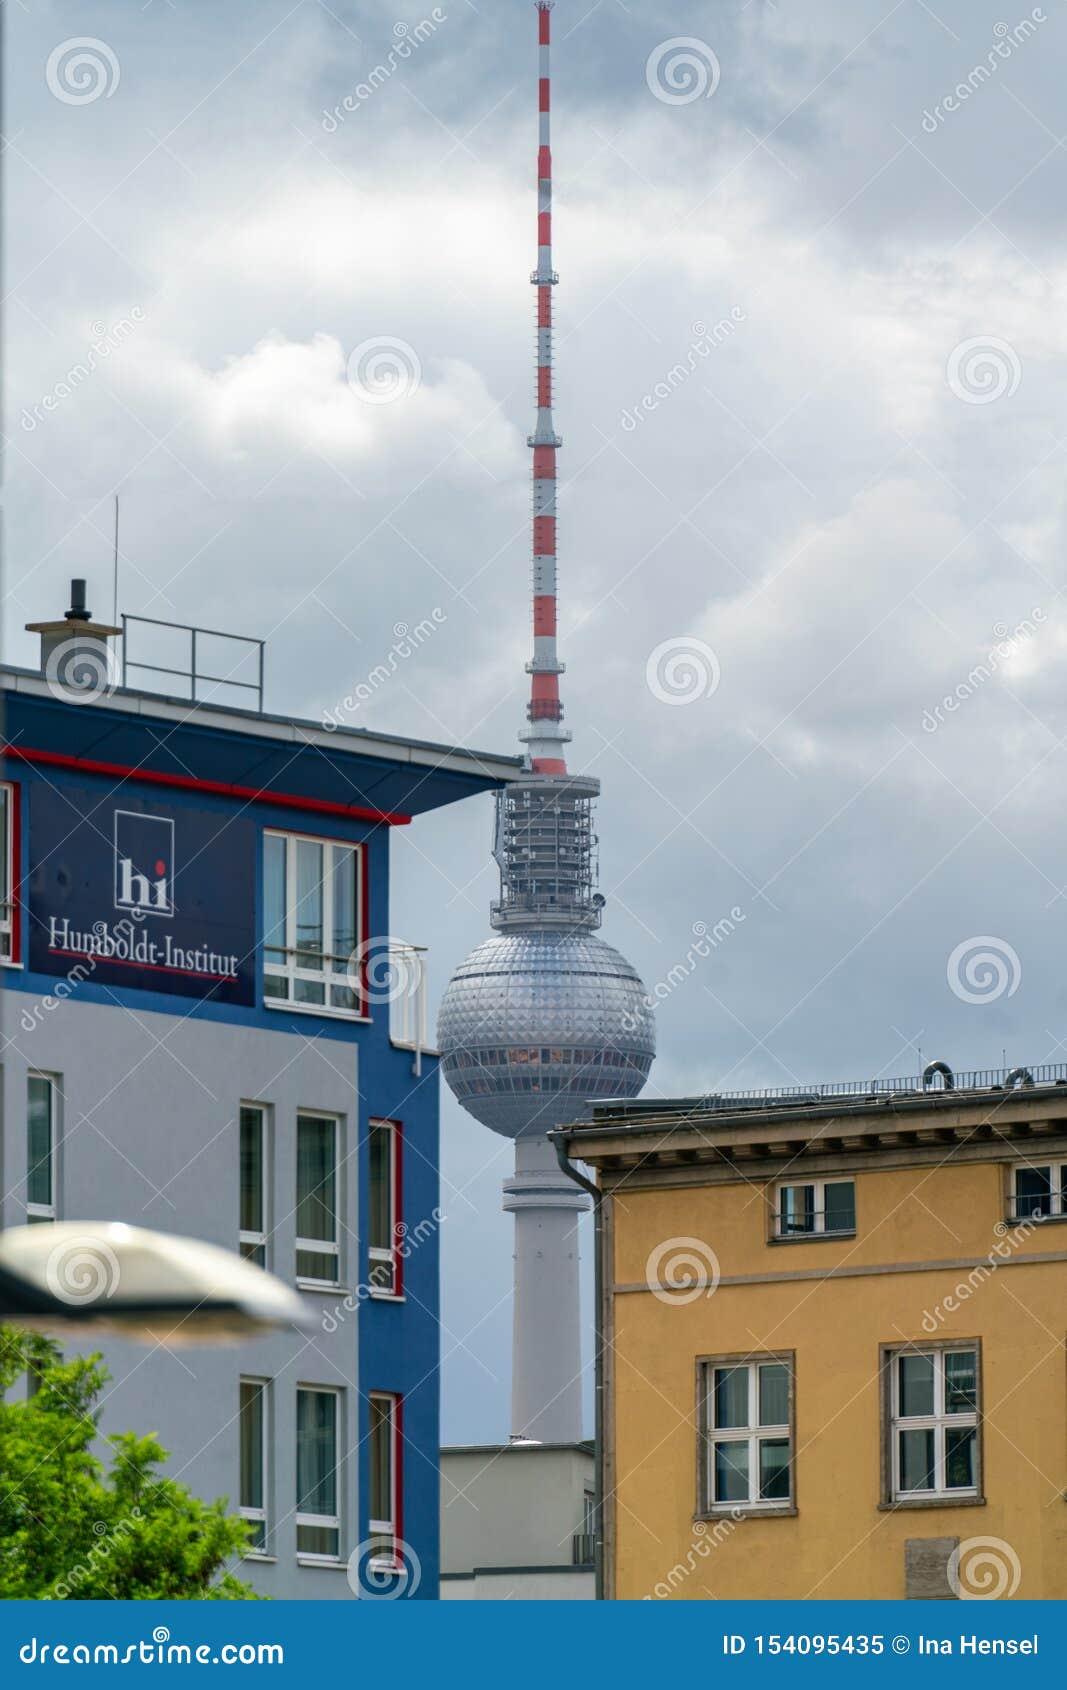 Elisabeth-Schwarzhaupt-Platz, Nordbahnhof, Berlin, Allemagne - 7 juillet 2019 : vue de la tour de TV dans la distance